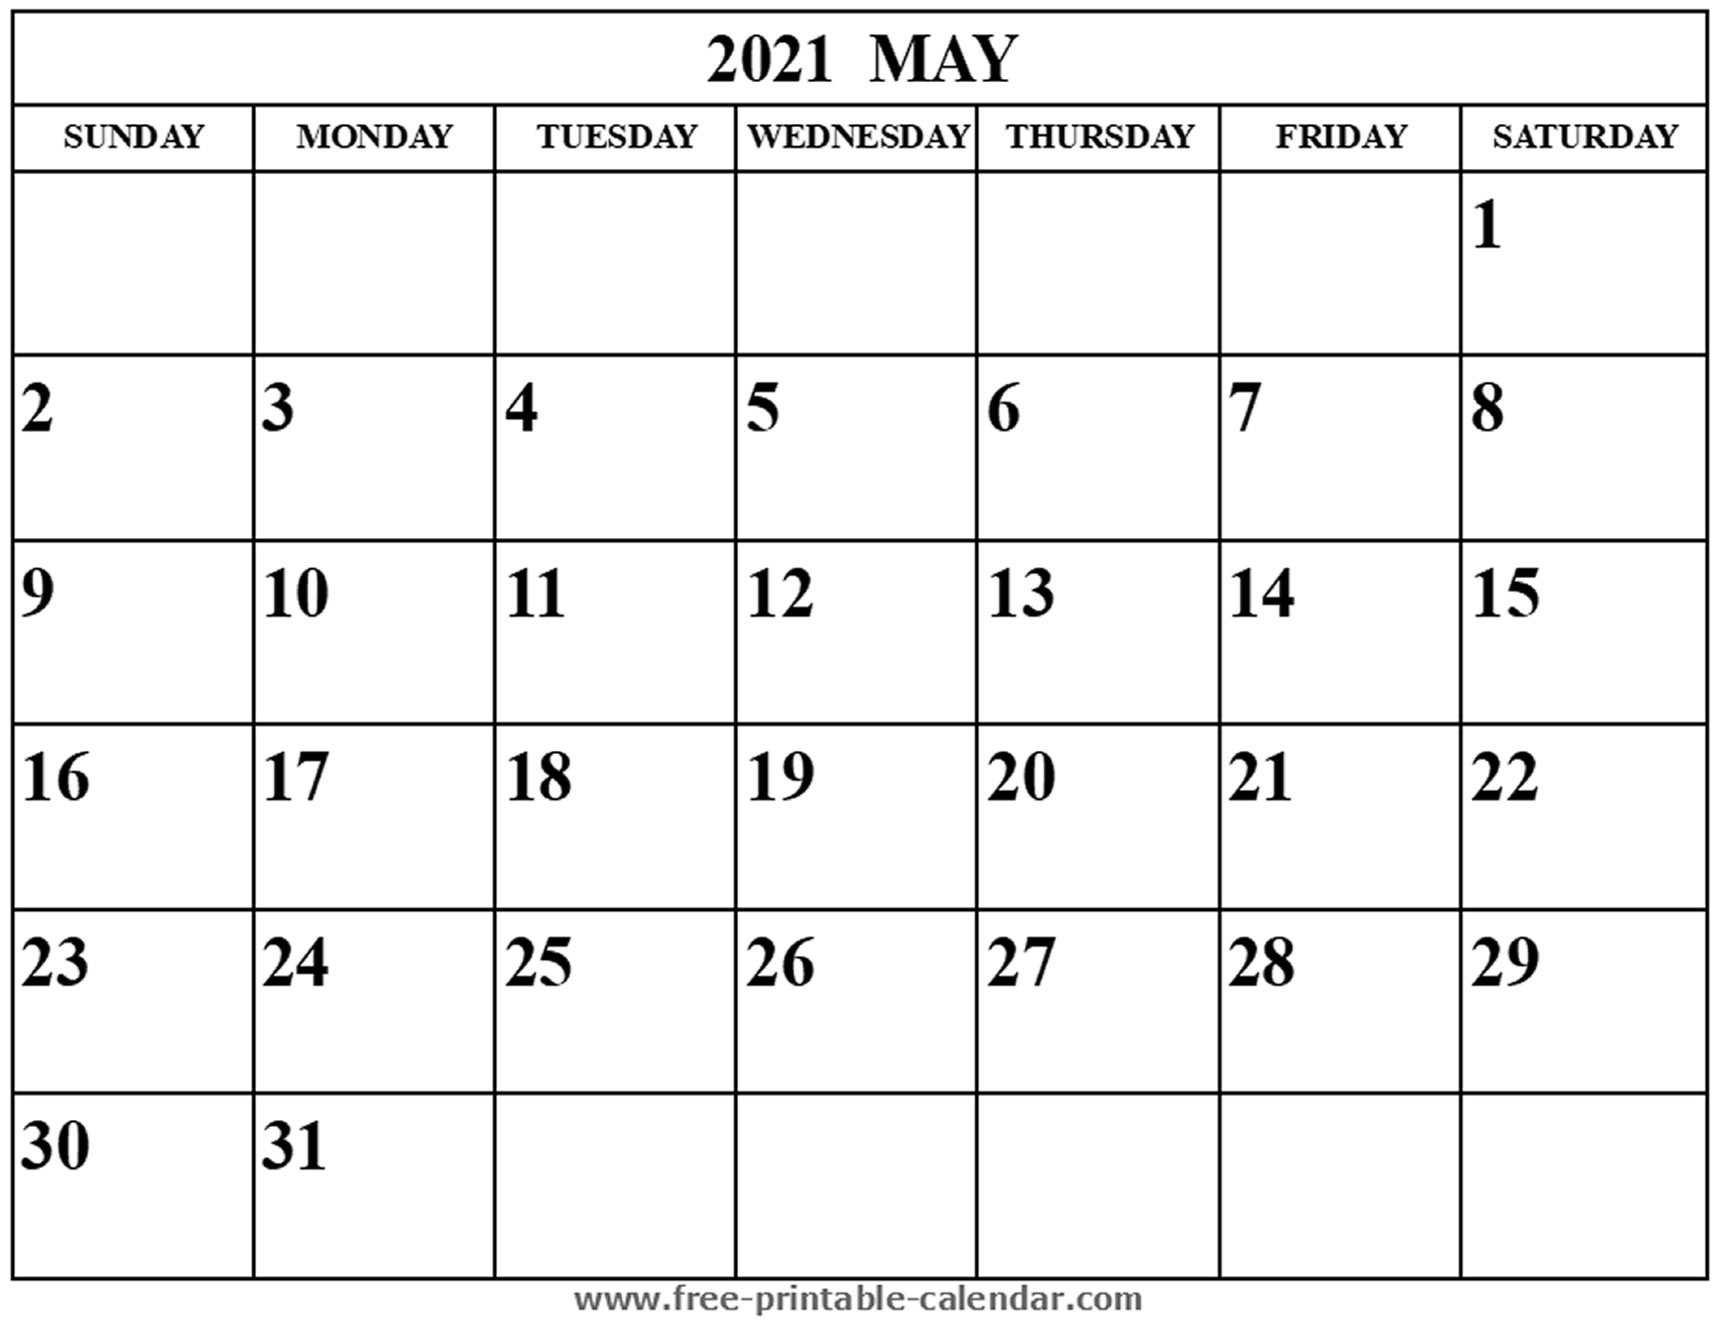 Blank May 2021 Calendar - Free-Printable-Calendar